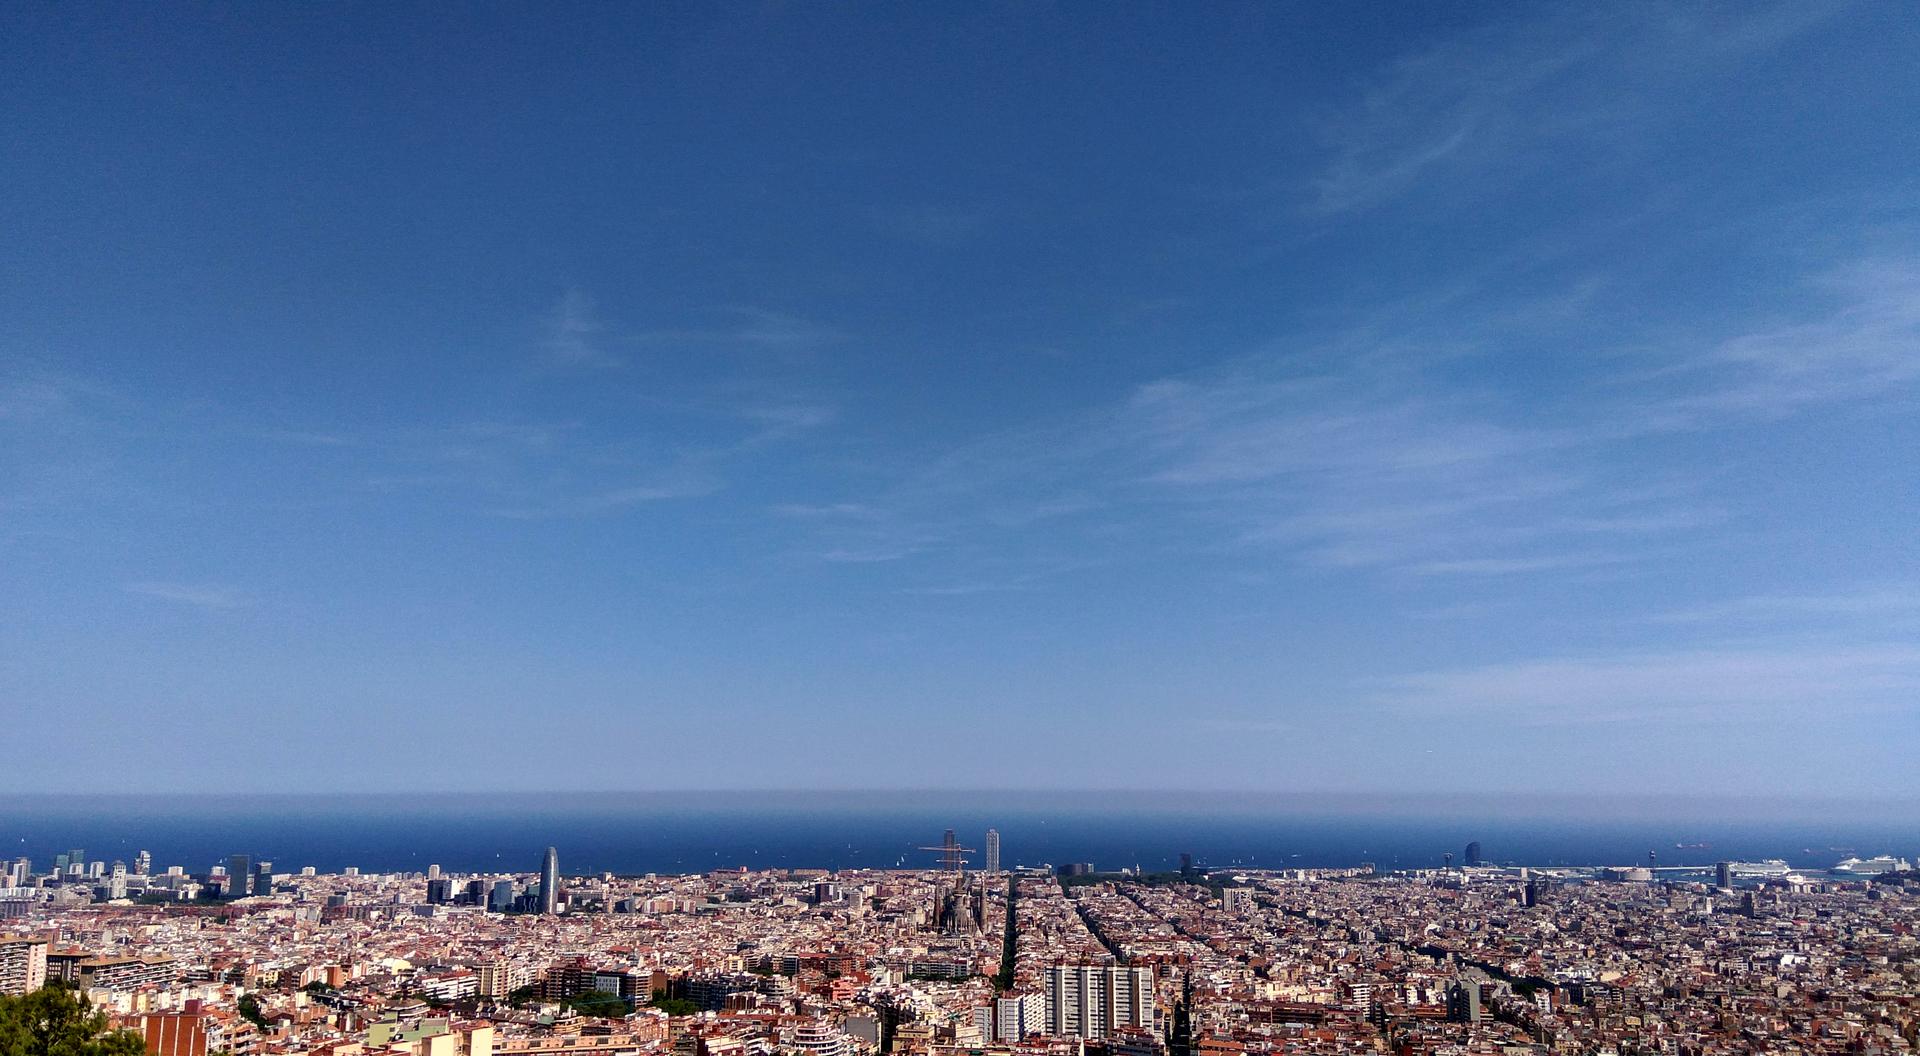 Barcelona - Parc Del Carmel, 05.06.2016